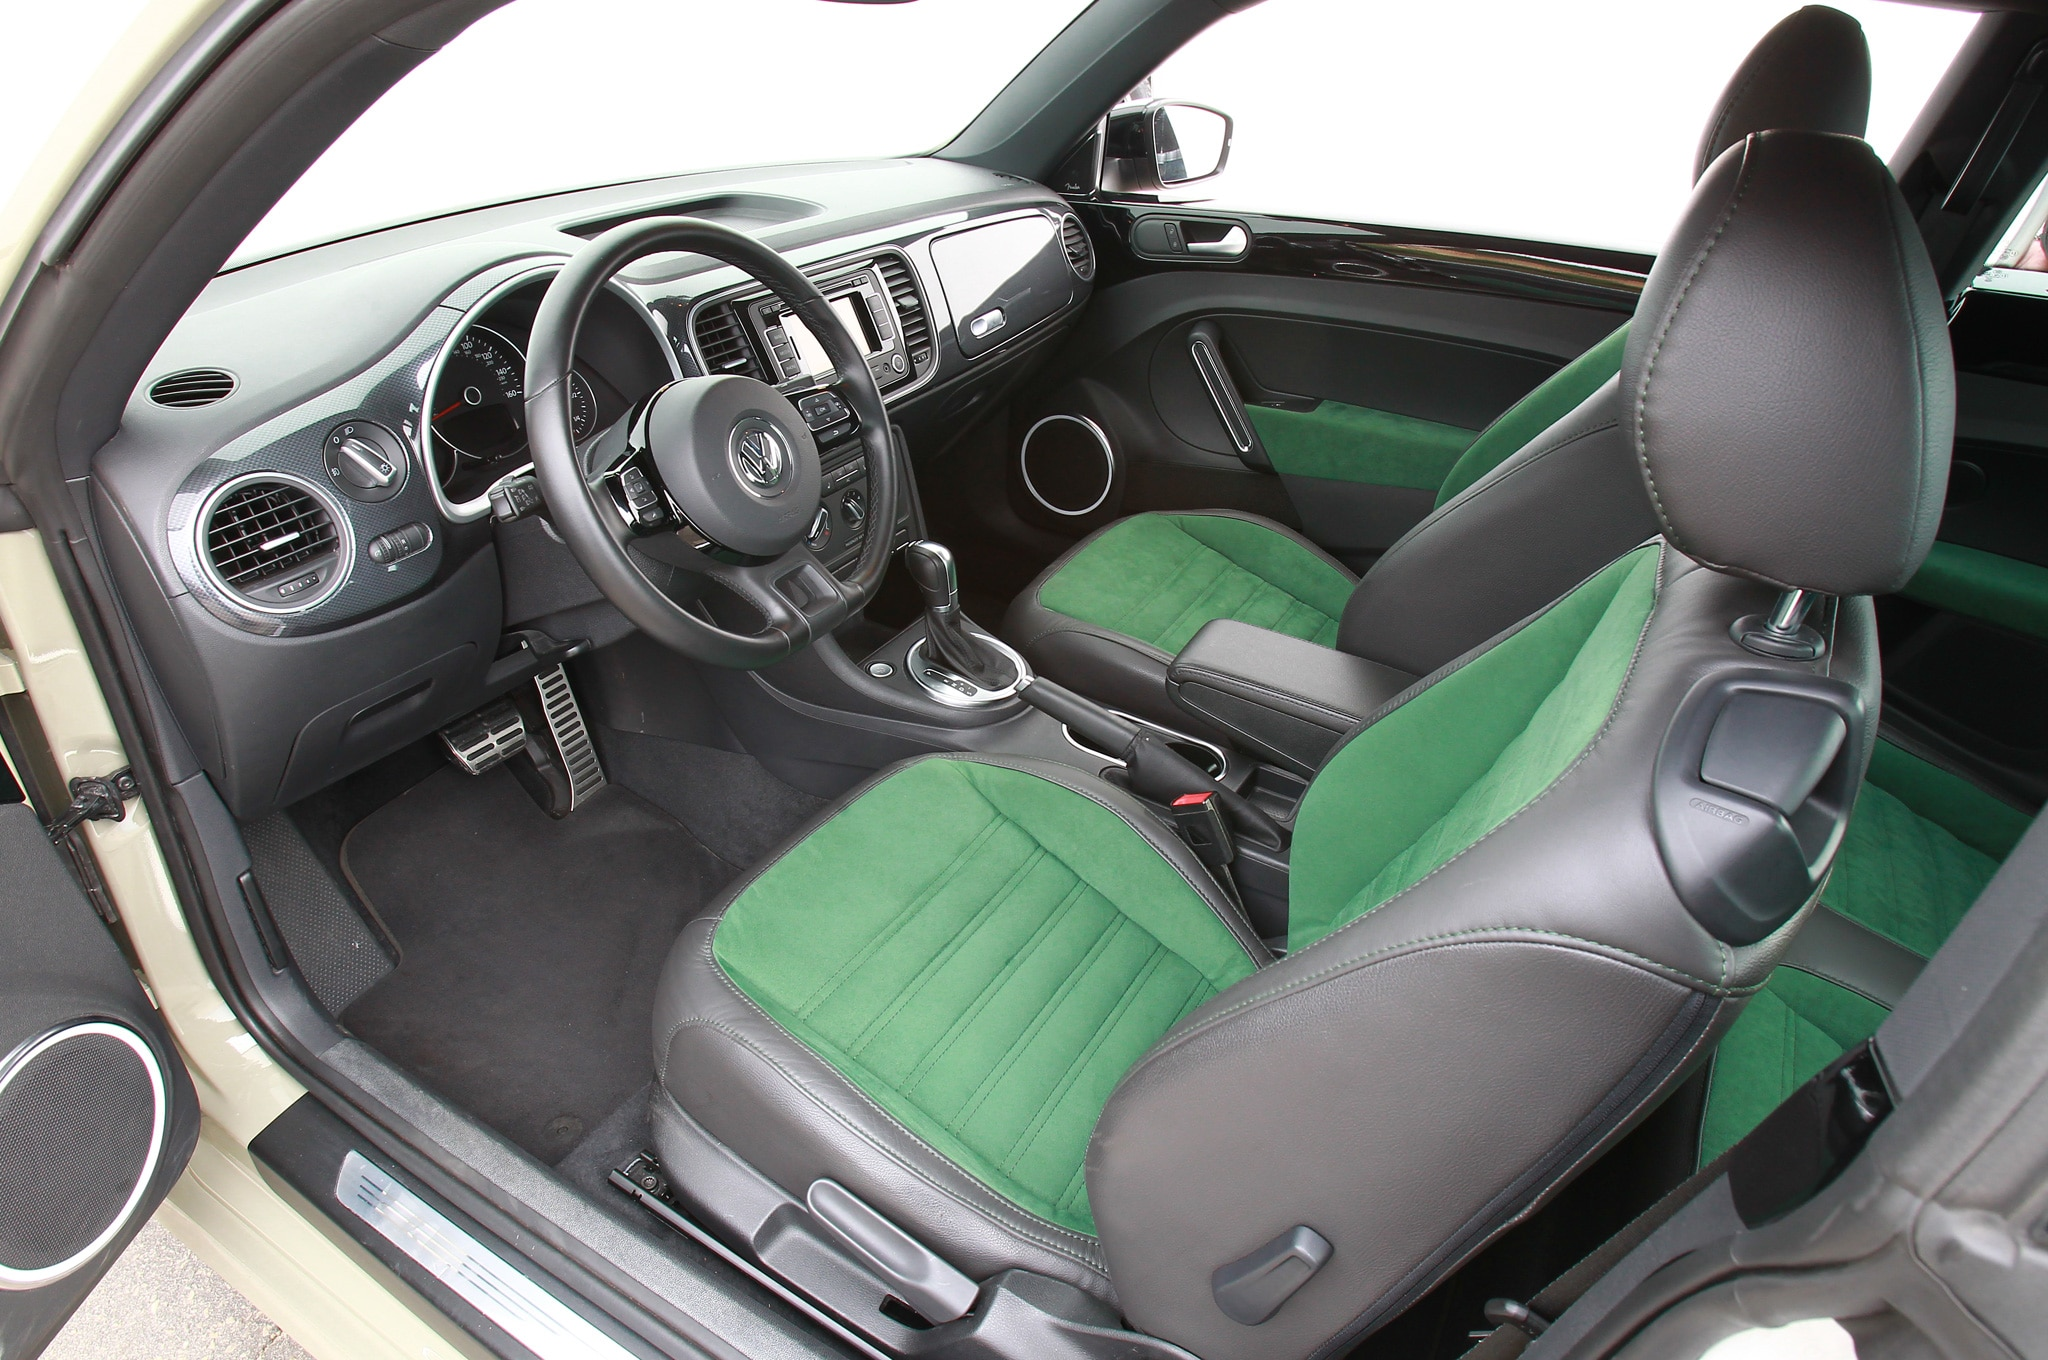 2012 volkswagen beetle turbo first drive automobile magazine. Black Bedroom Furniture Sets. Home Design Ideas